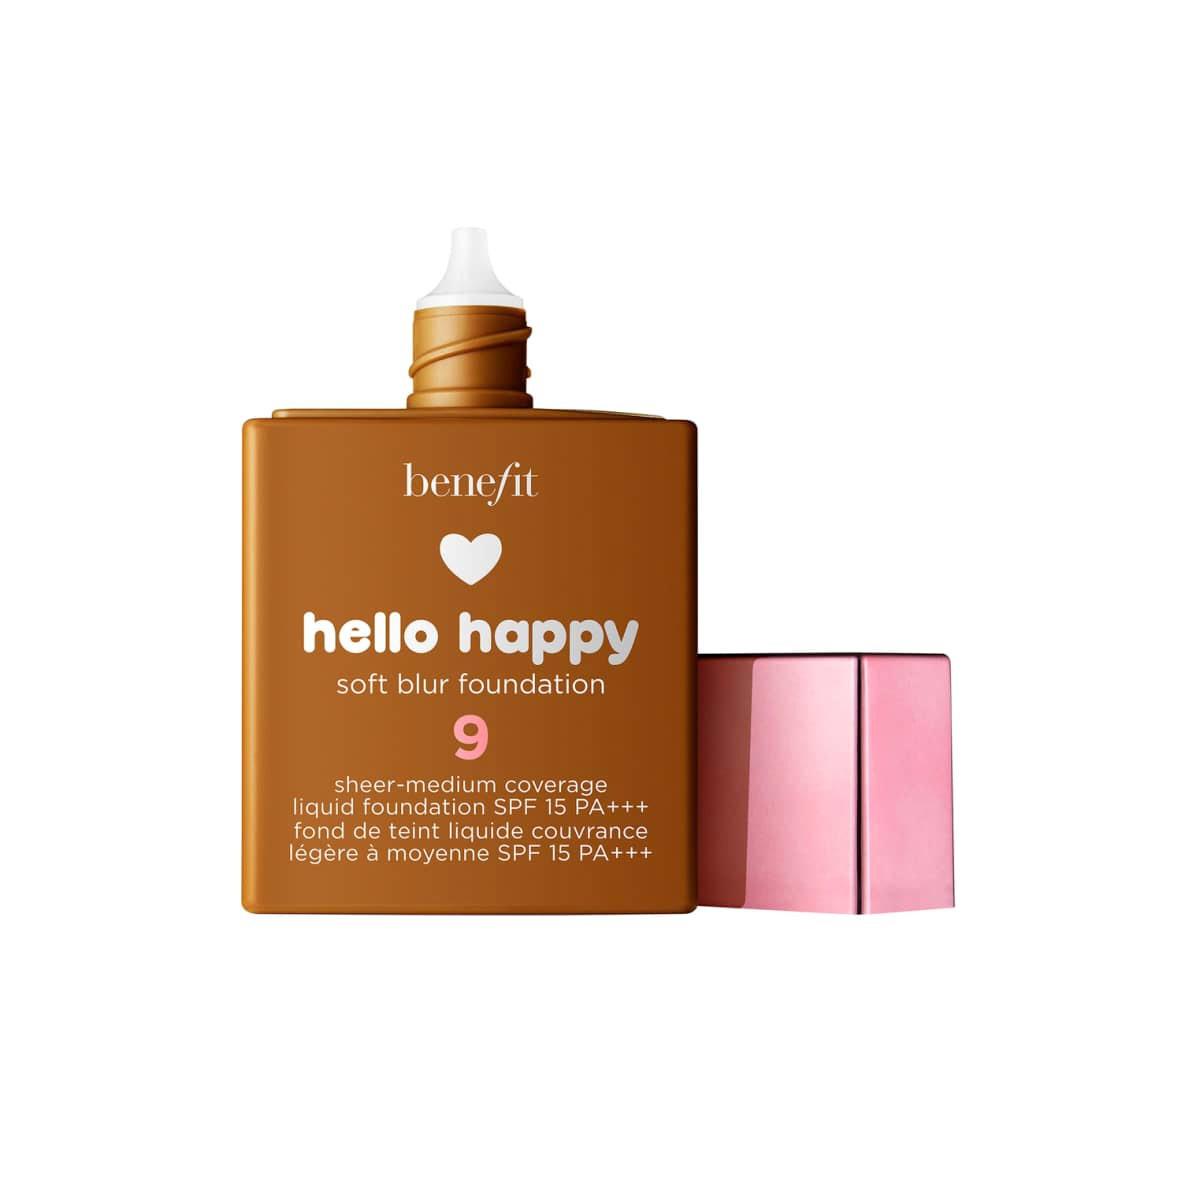 Benefit Hello Happy Soft Blur Foundation 9